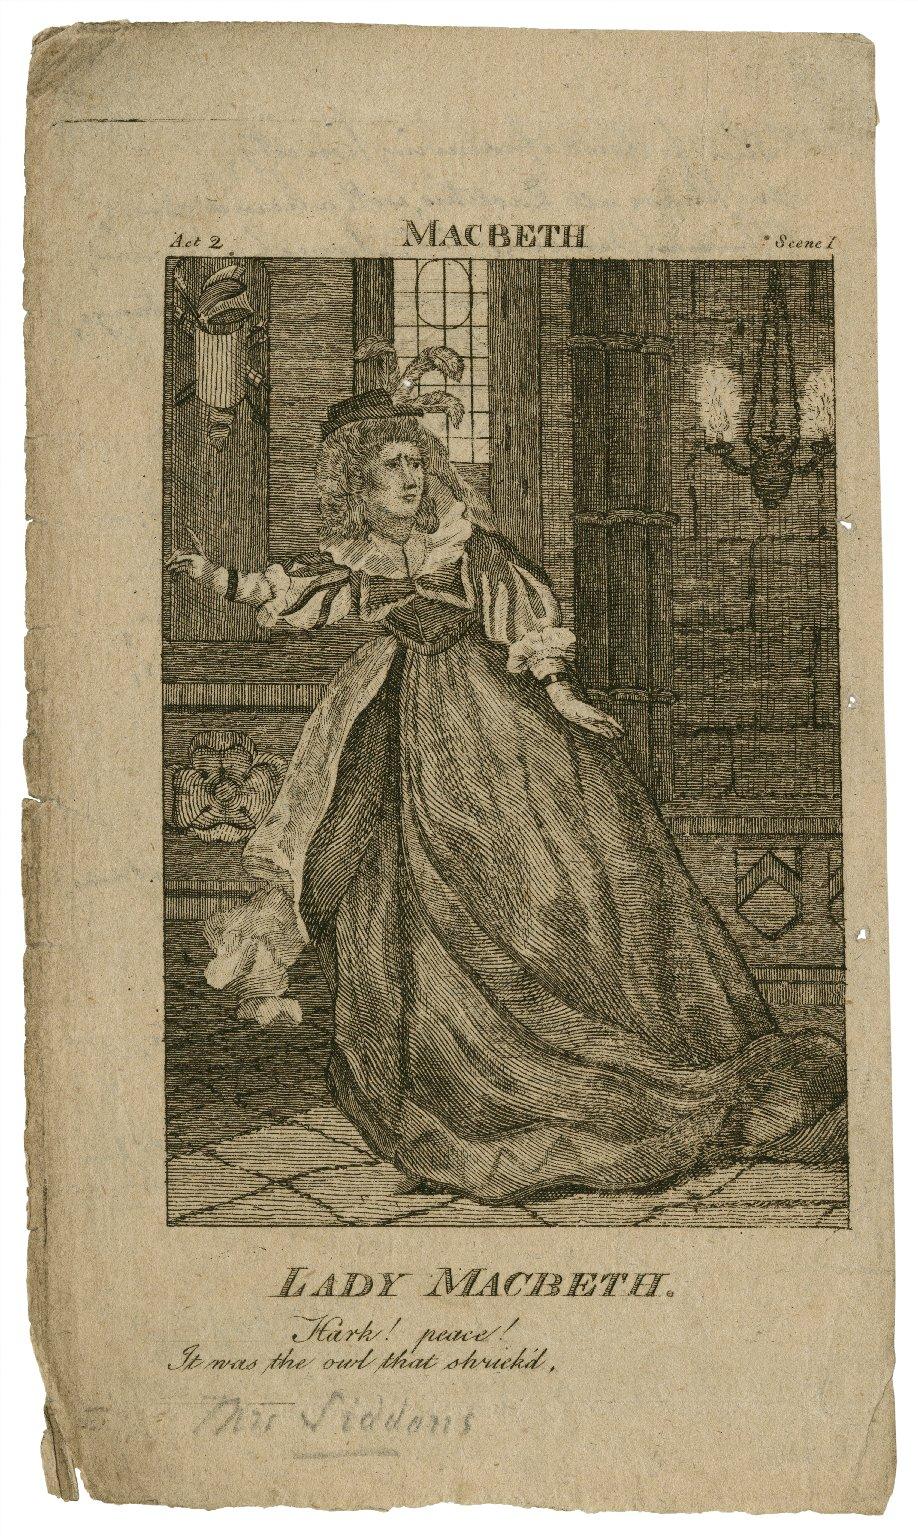 Lady Macbeth, Hark! peace! it was the owl that shriek'd, act 2, scene I [in Shakespeare's] Macbeth [graphic].